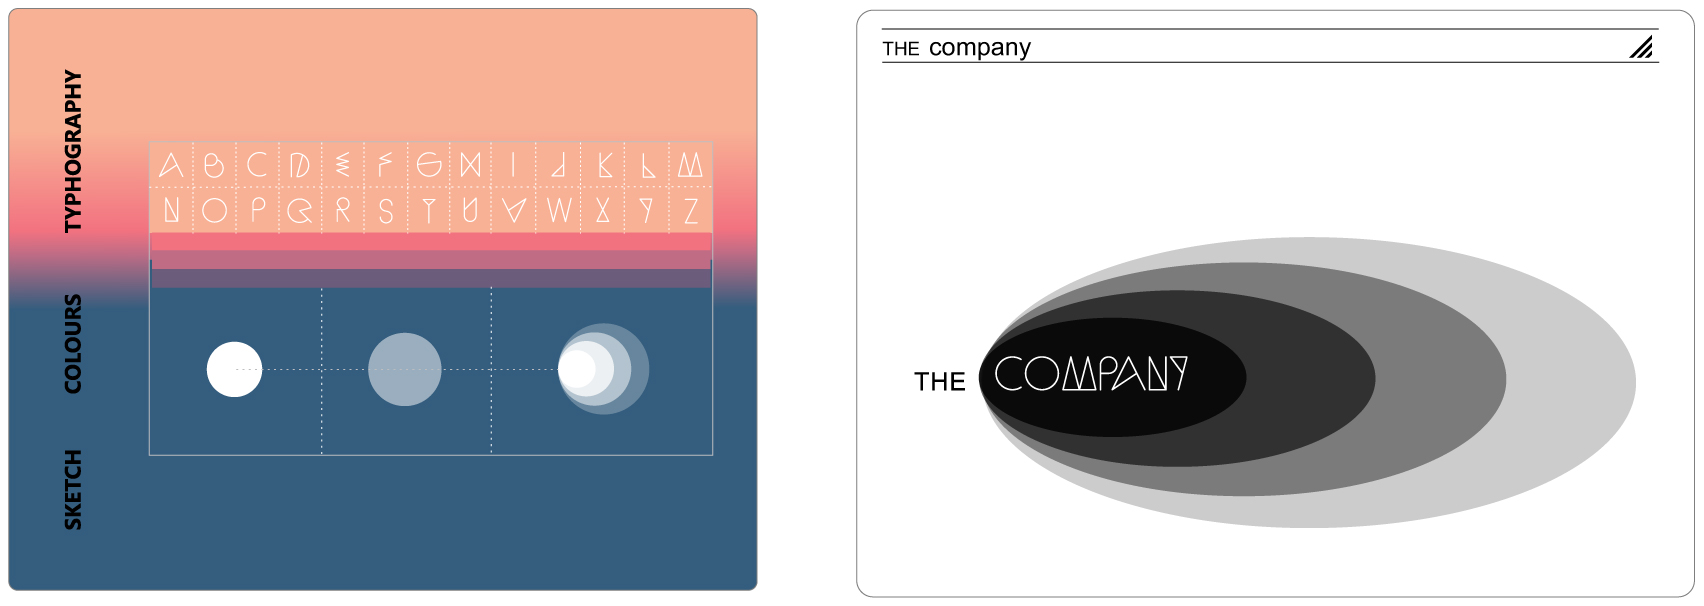 Branding Division - Design